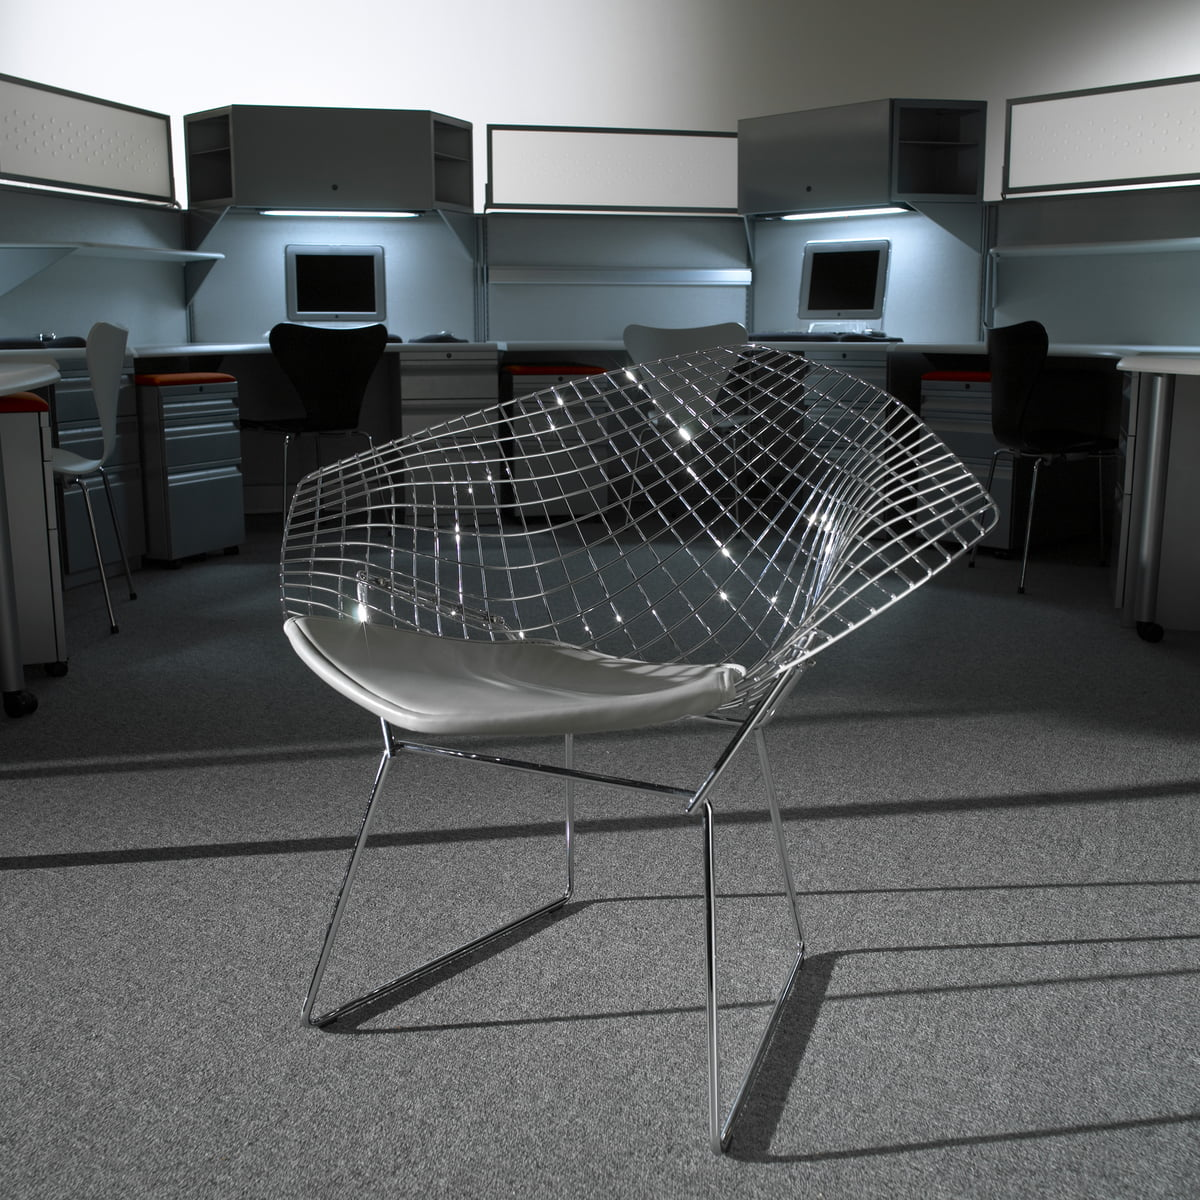 fauteuil bertoia diamond de knoll dans la boutique. Black Bedroom Furniture Sets. Home Design Ideas